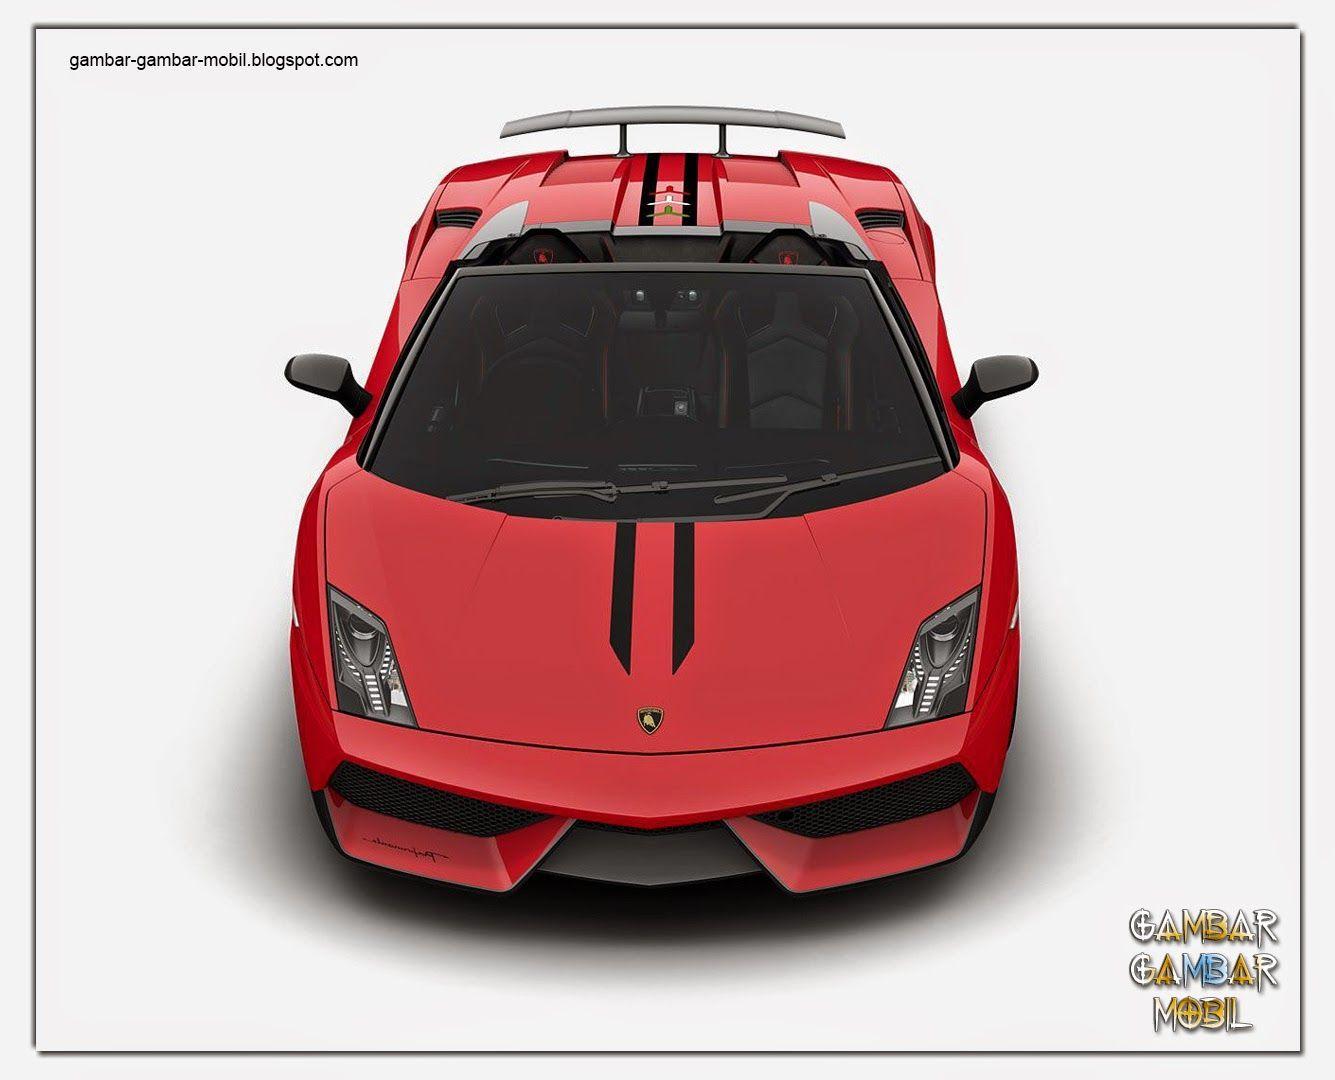 Gambar Mobil Balap Galardo Gambar Gambar Mobil Lamborghini Gallardo Gambar Mobil Red Lamborghini